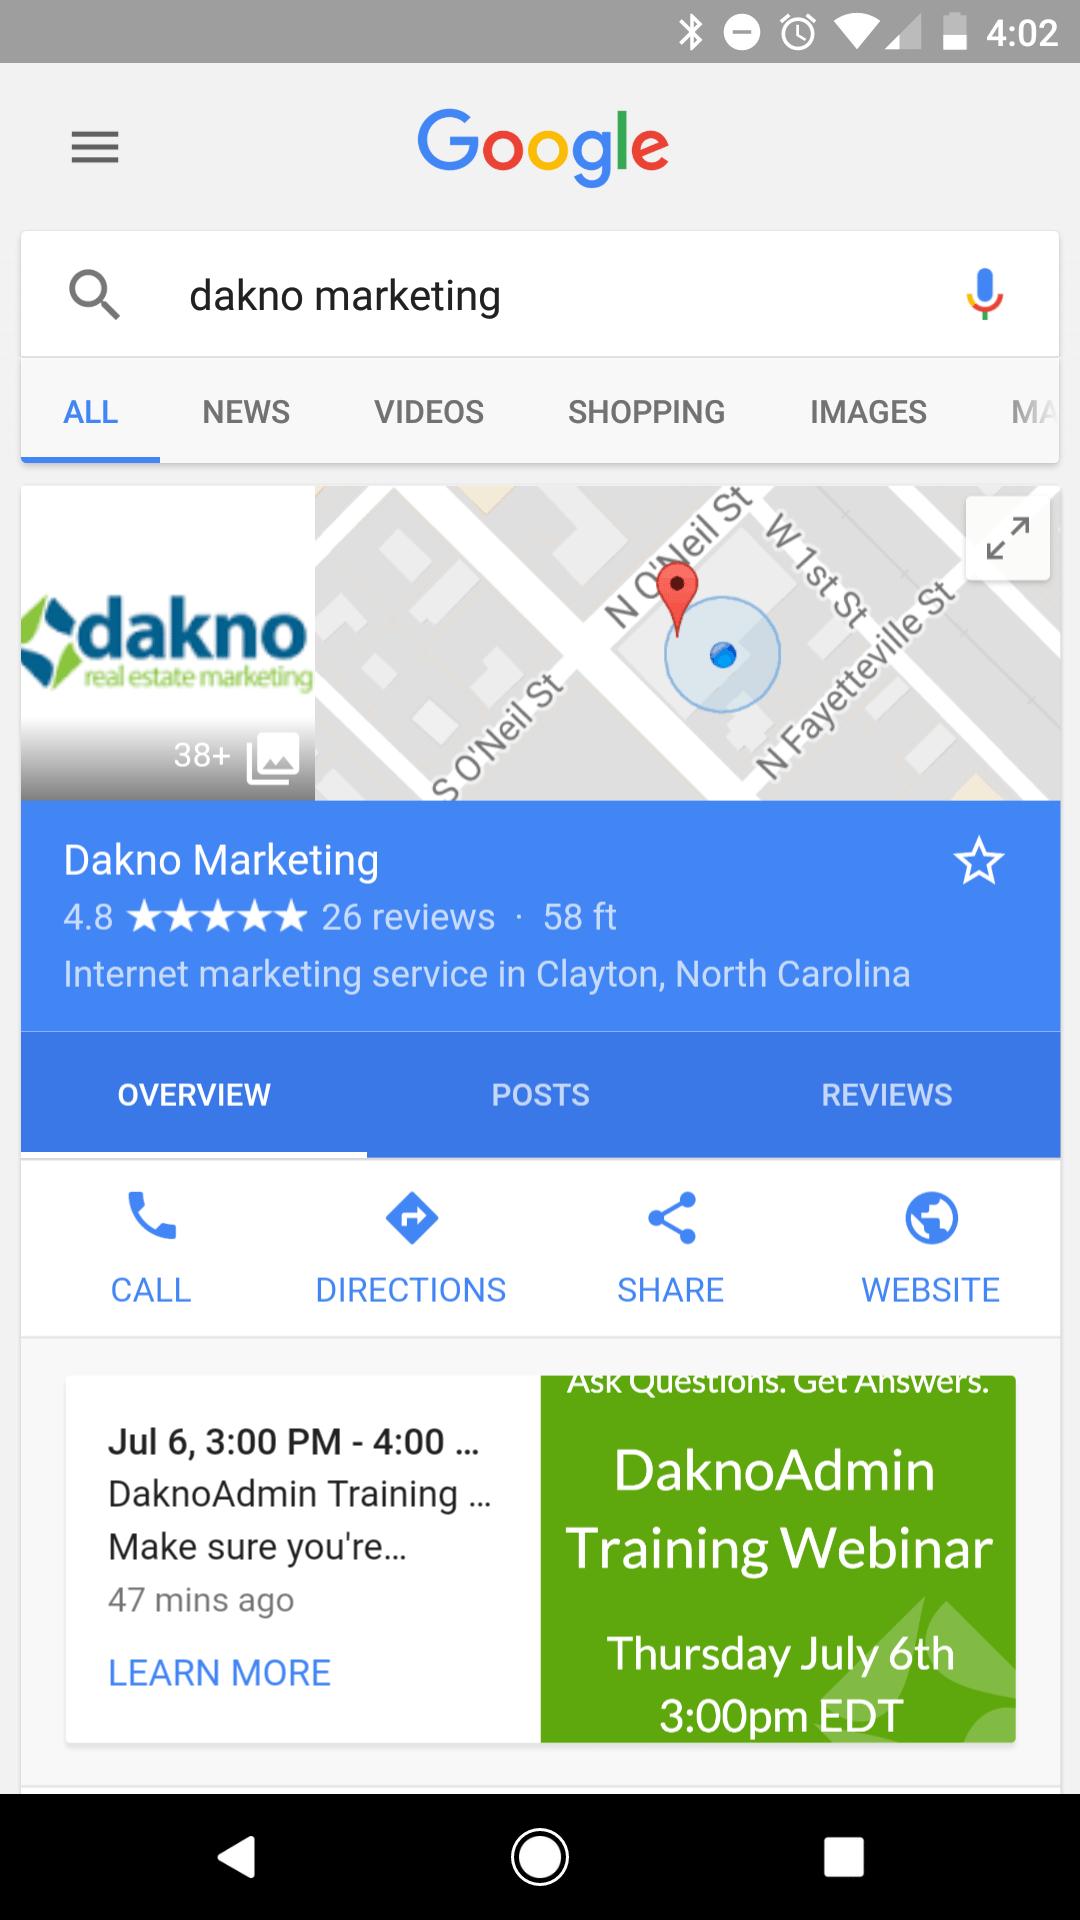 screenshot of dakno marketing's google card showing the new google post